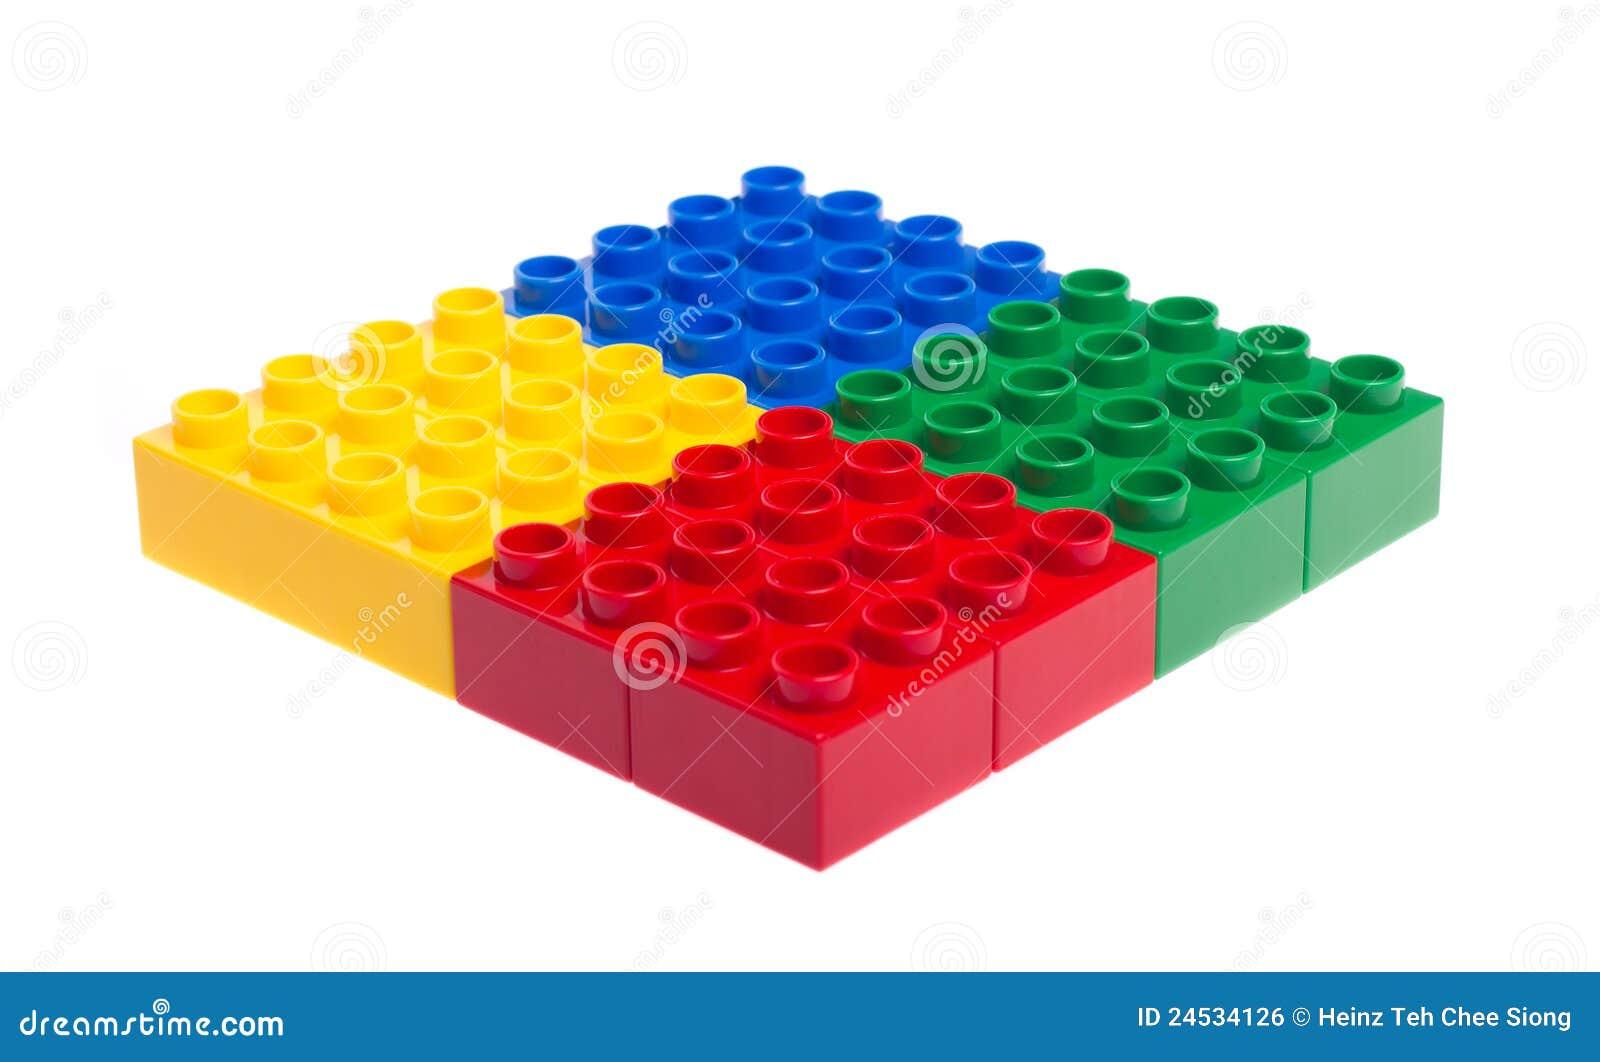 Plastic Building Blocks Royalty Free Stock Image Image